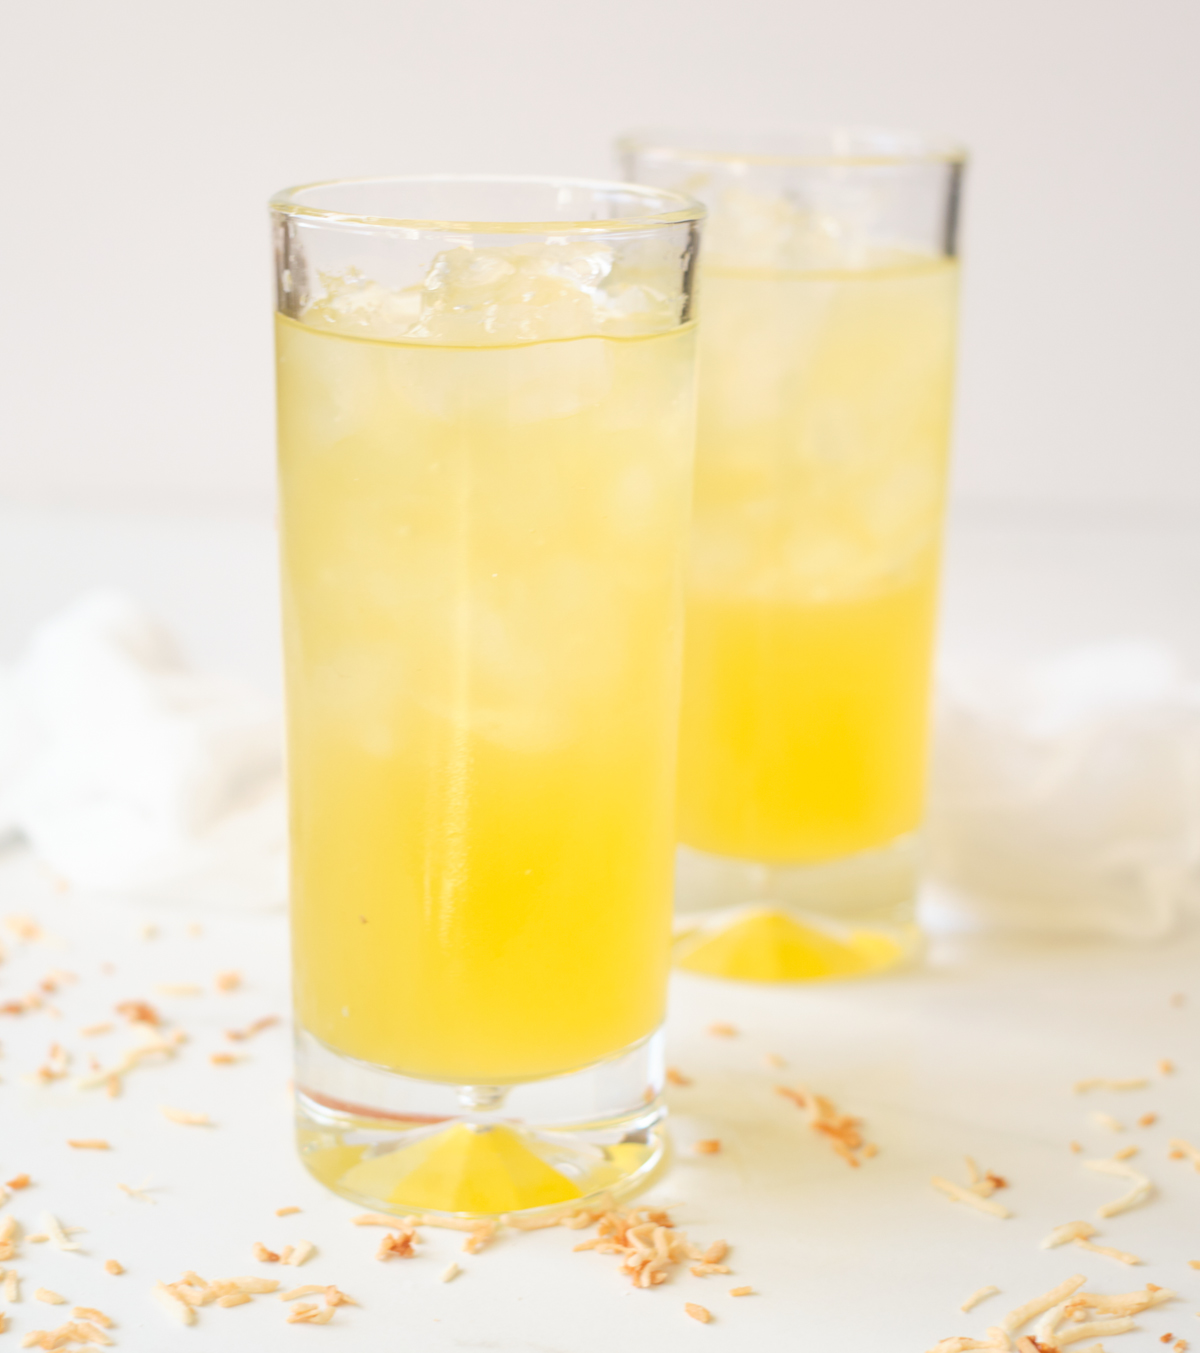 Pineapple Italian Soda